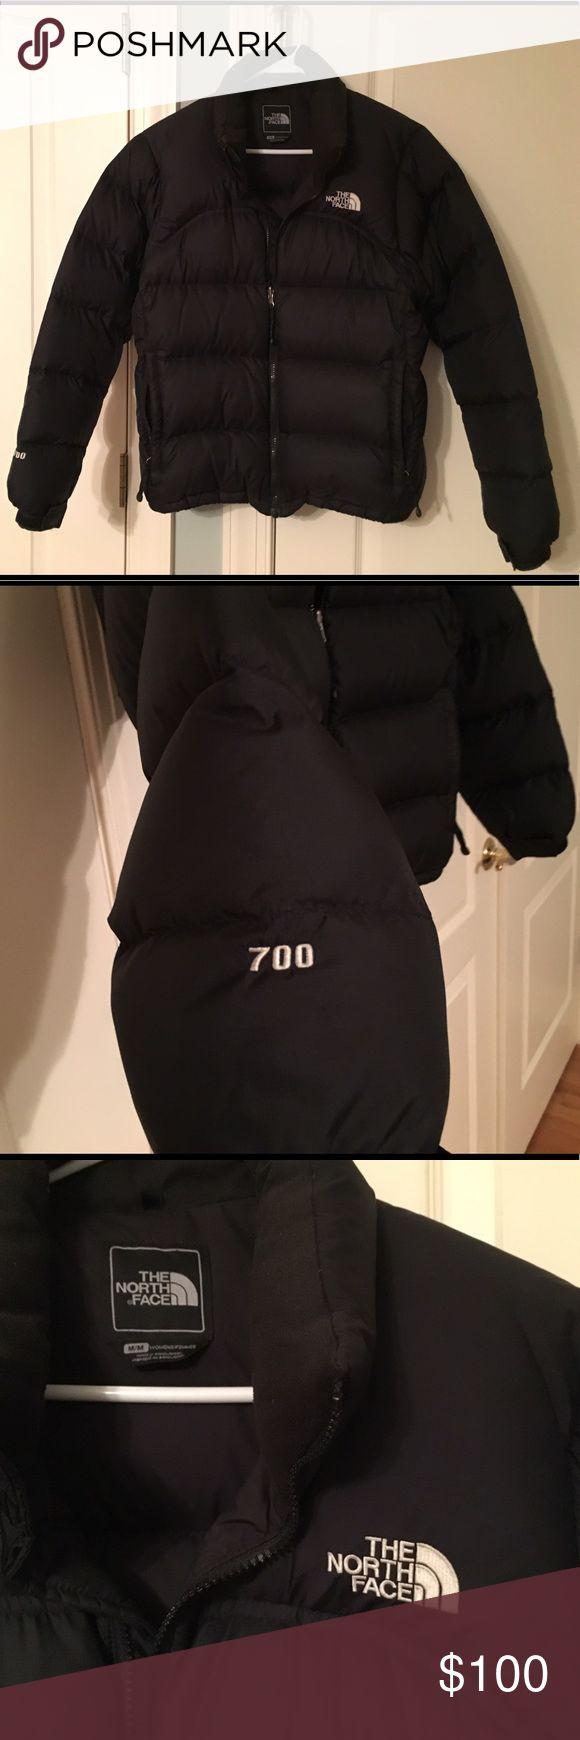 Women's Medium Northface Ski Jacket Lightly worn, Northface down ski jacket (700). North Face Jackets & Coats Puffers